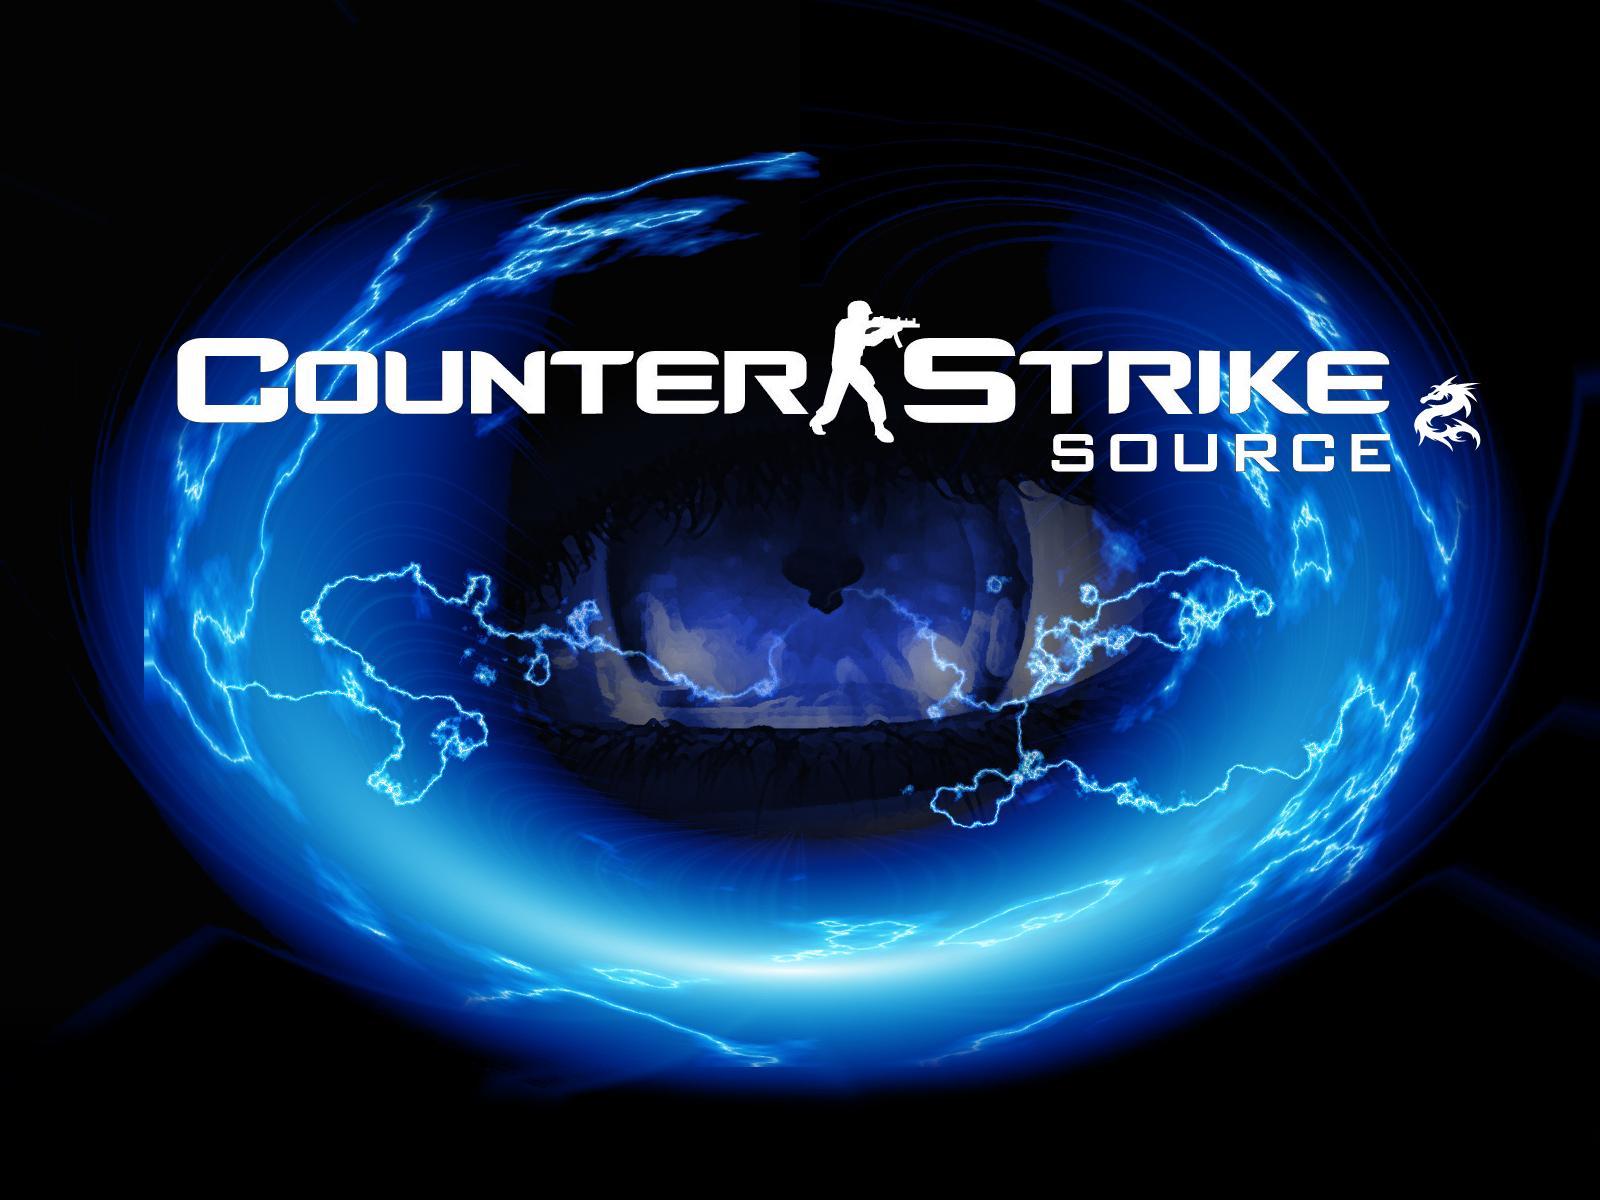 http://2.bp.blogspot.com/-4q3PajZC10o/TdU9_9BJG5I/AAAAAAAAB7s/-vvTZzP_V6k/s1600/Counter_strike_2.jpg